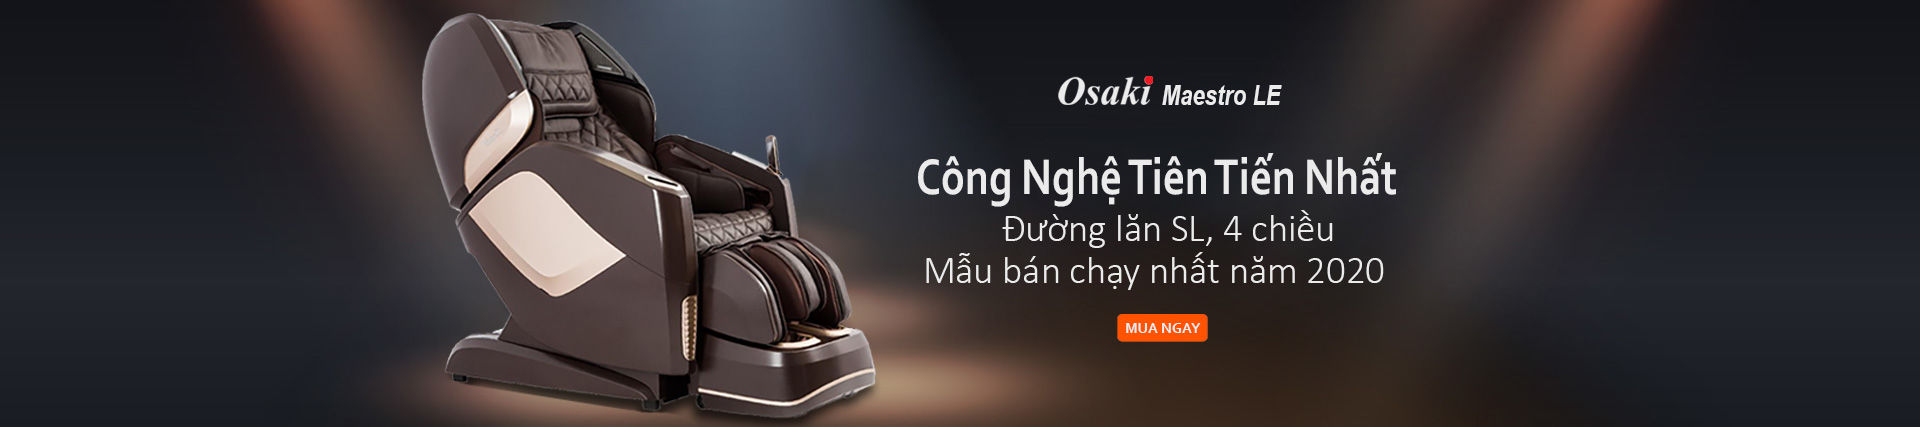 Ghế massage Osaki OS Maestro LE